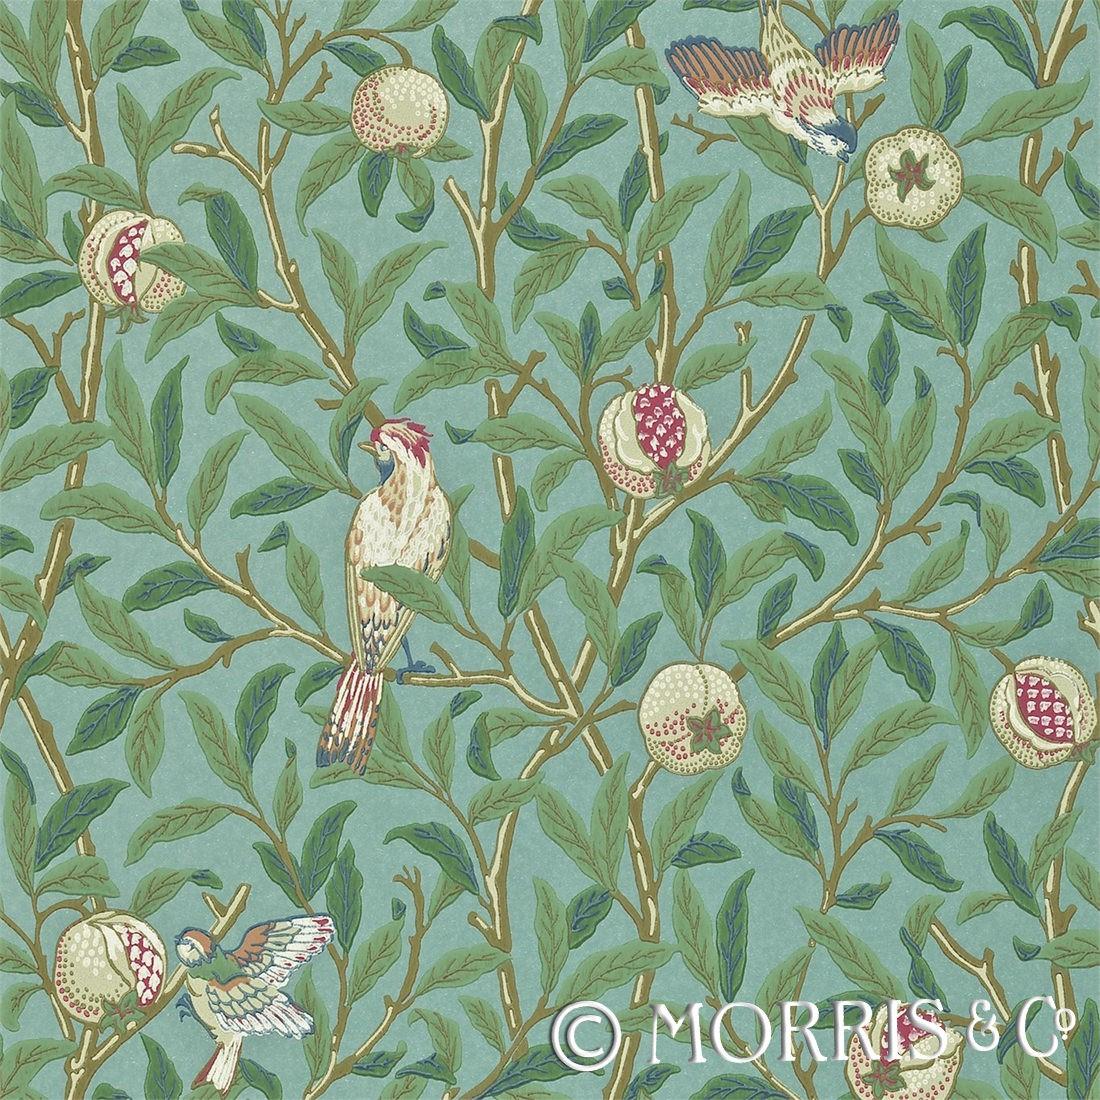 Morris & Co Tapet Bird Pomegranate Turquoise/Coral